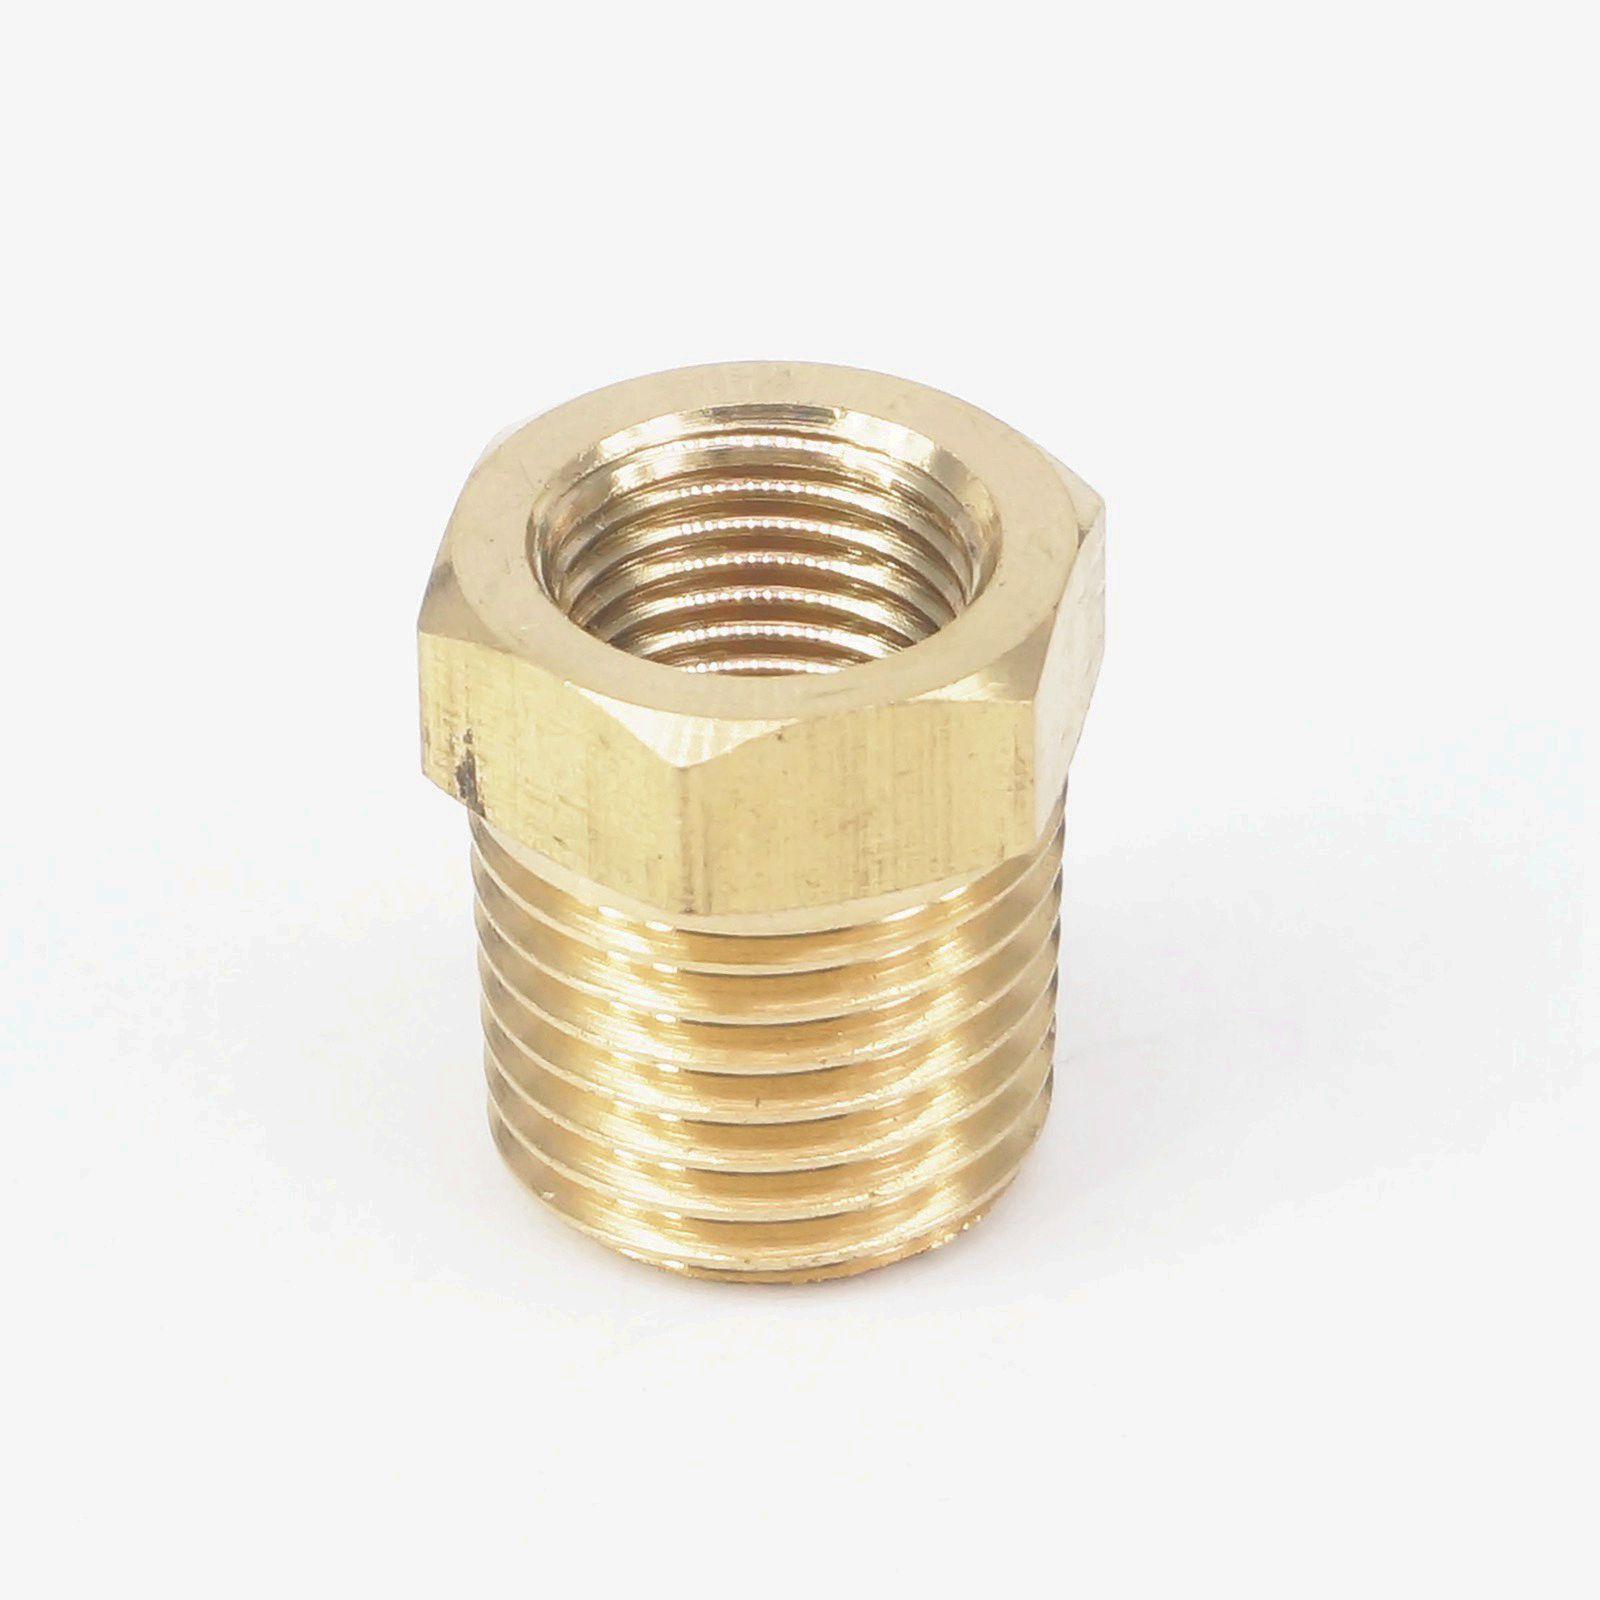 "Conector de montaje de tubería de latón hembra NPT Macho x 1/4 ""NPT, adaptador para agua de combustible de Gas y aire, 1/8"""